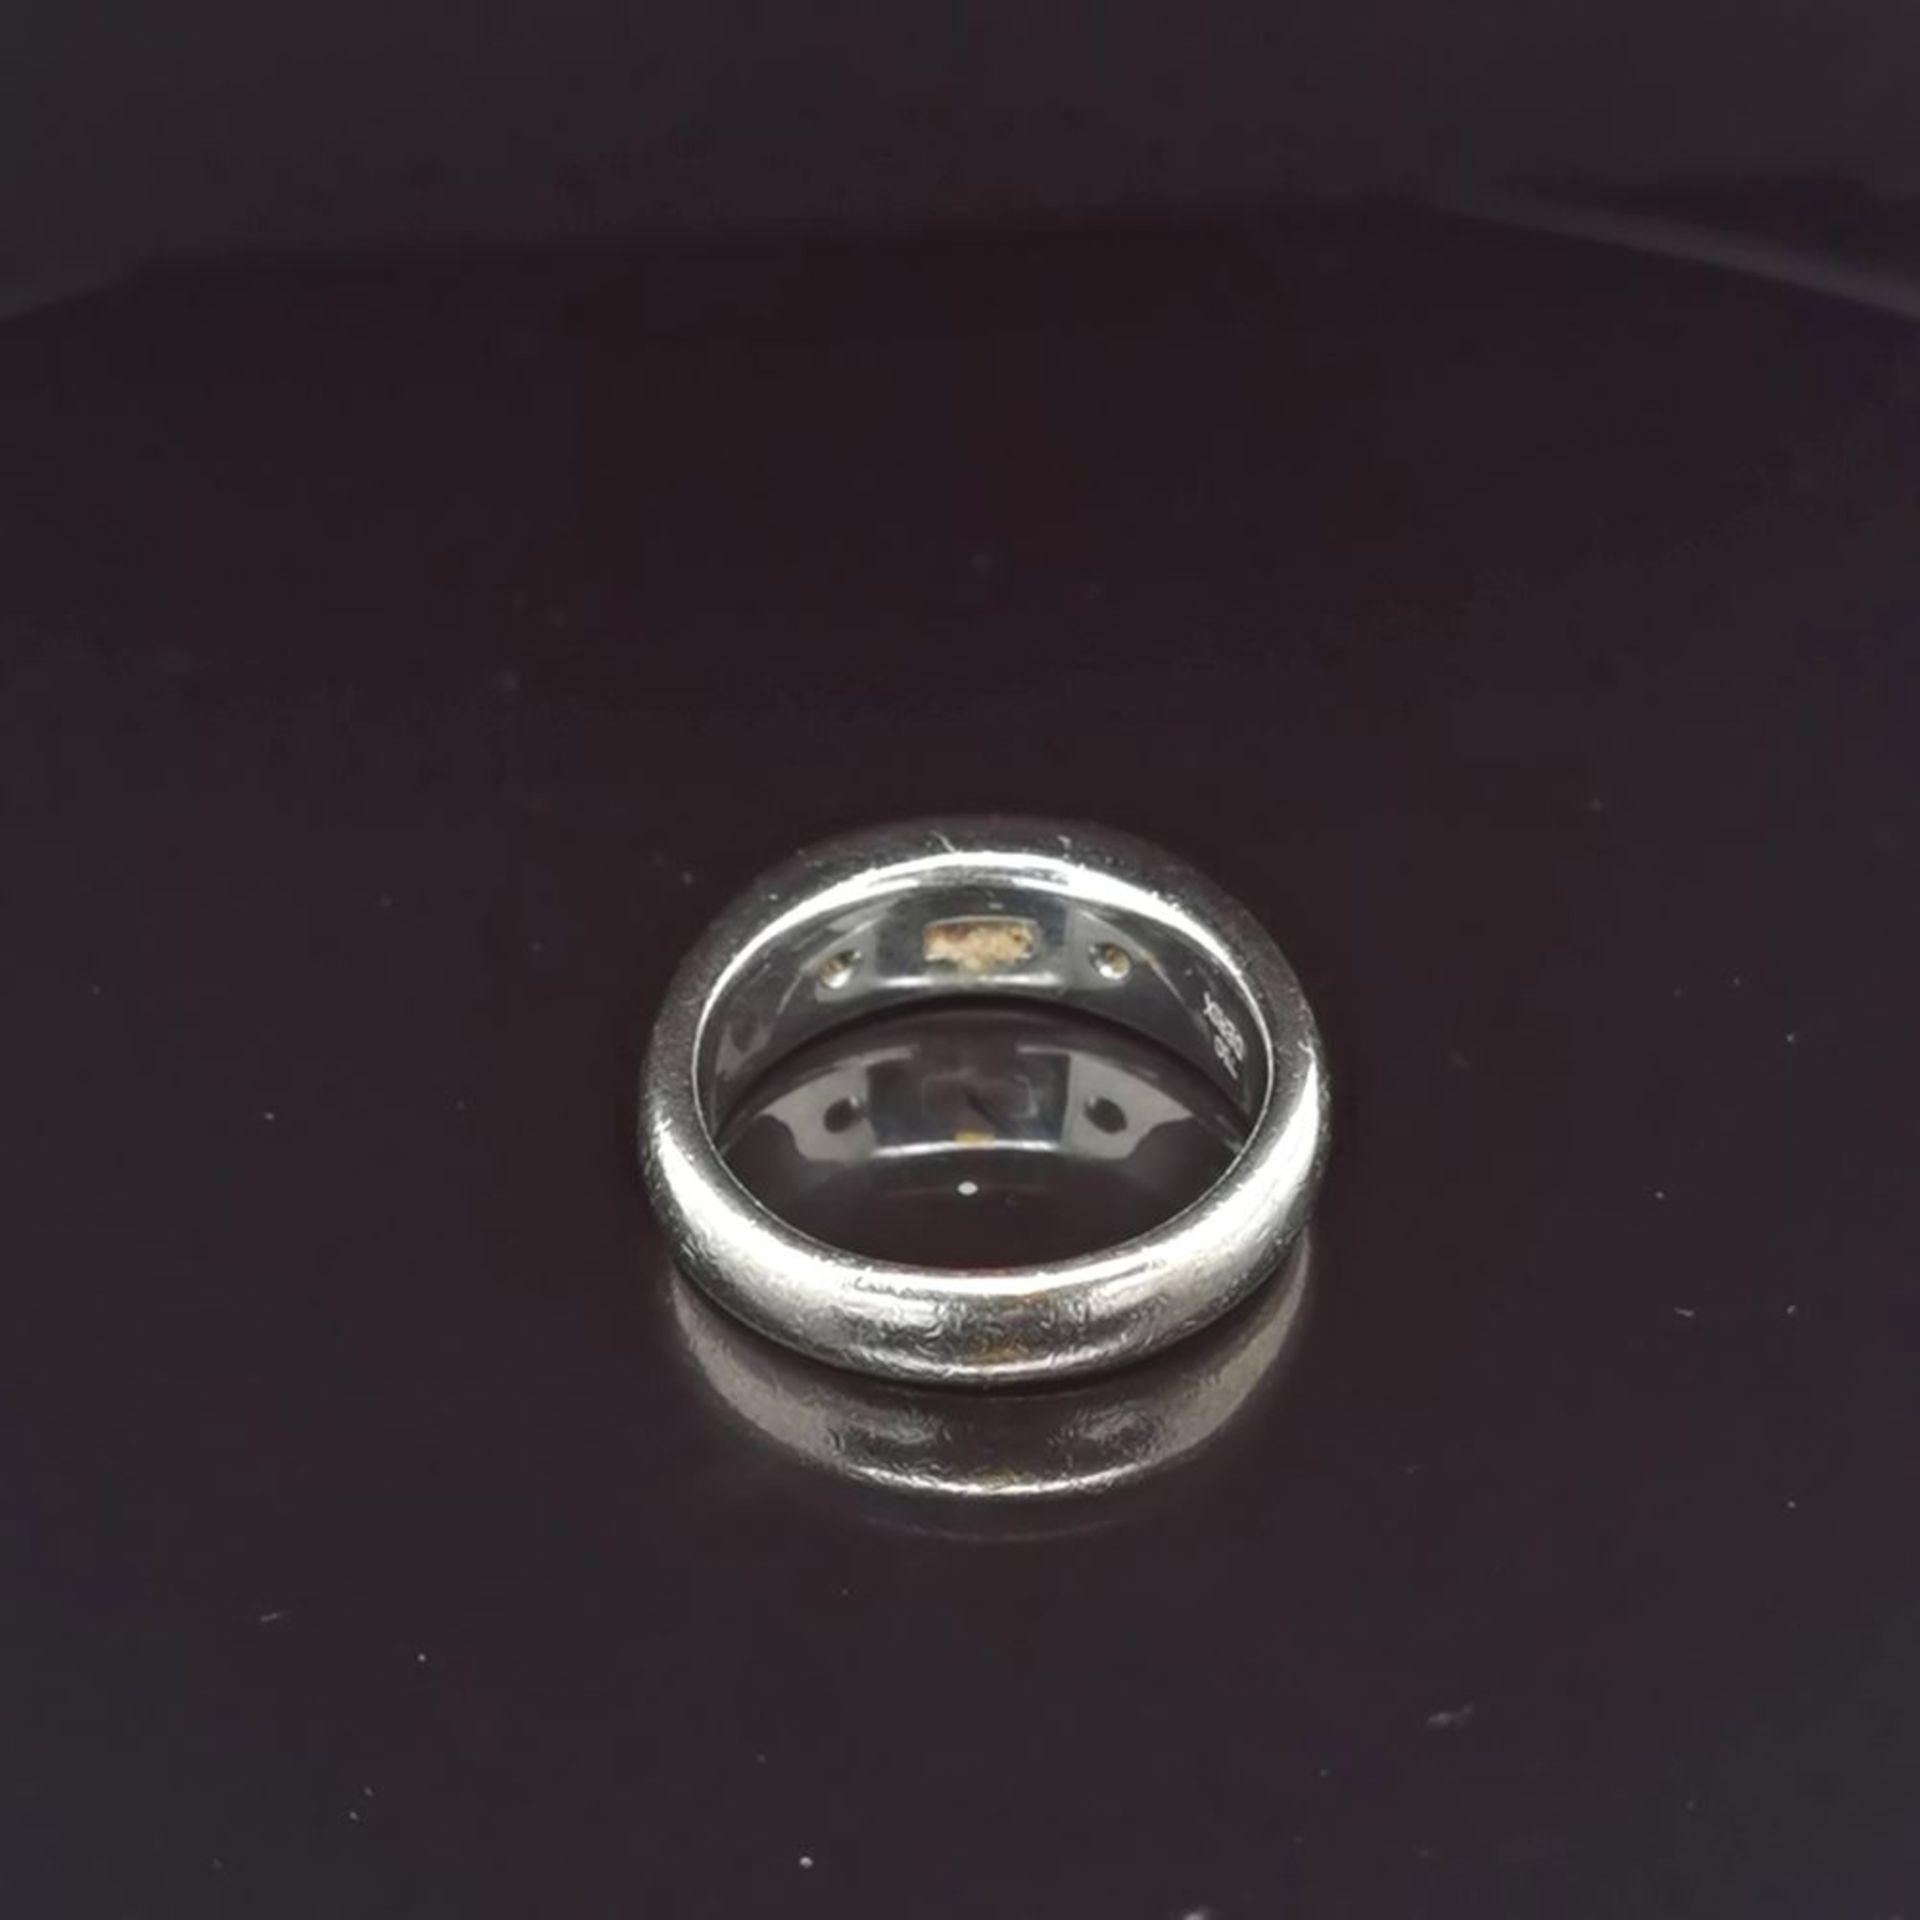 Diamant-Ring, 750 Weißgold 13,6 - Image 3 of 3